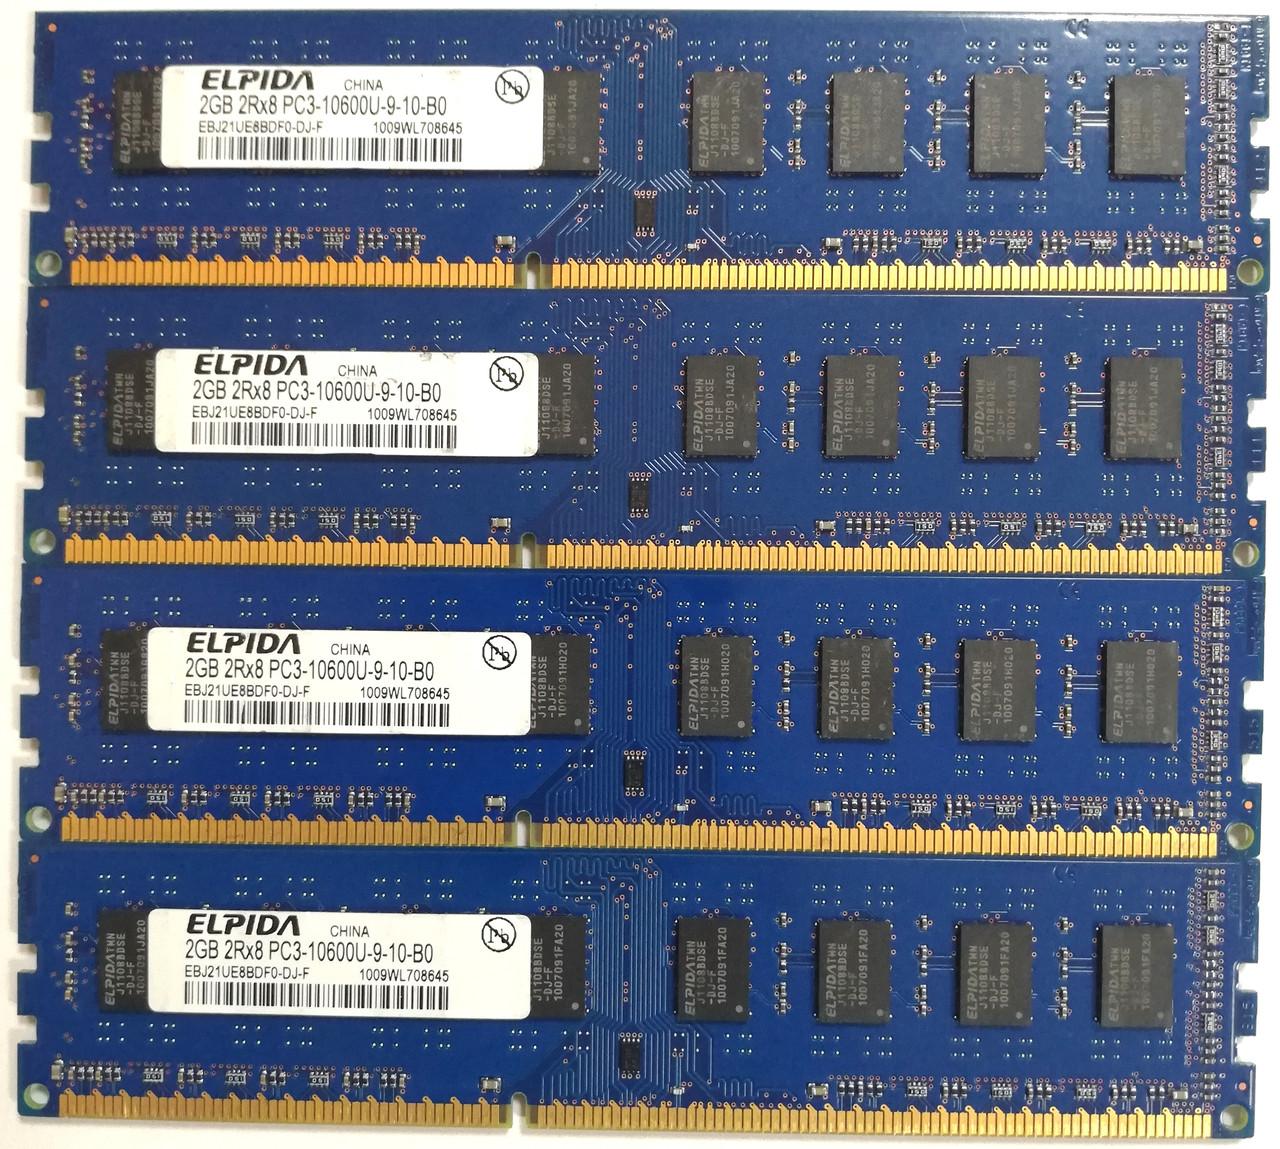 Комплект оперативной памяти Elpida DDR3 8Gb (4*2Gb) 1333MHz PC3-10600U CL9 (EBJ21UE8BDF0-DJ-F) Б/У